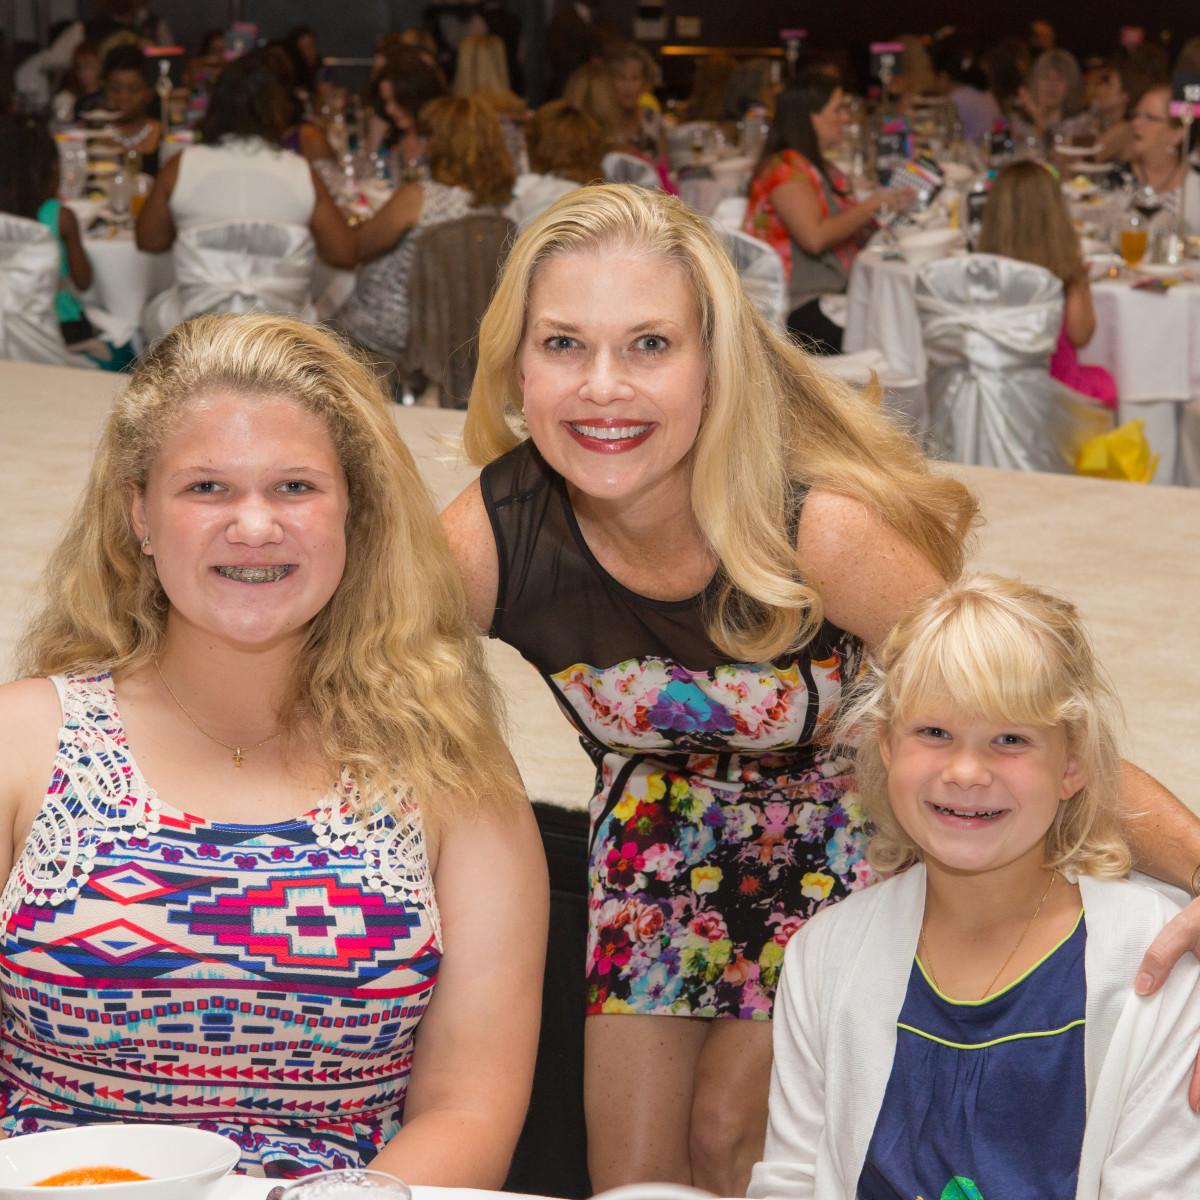 Houston, Woman's Hospital of Texas Labor Day Luncheon, August 2015, Kendall Pierce, Kaitlyn Pierce, Amy Pierce